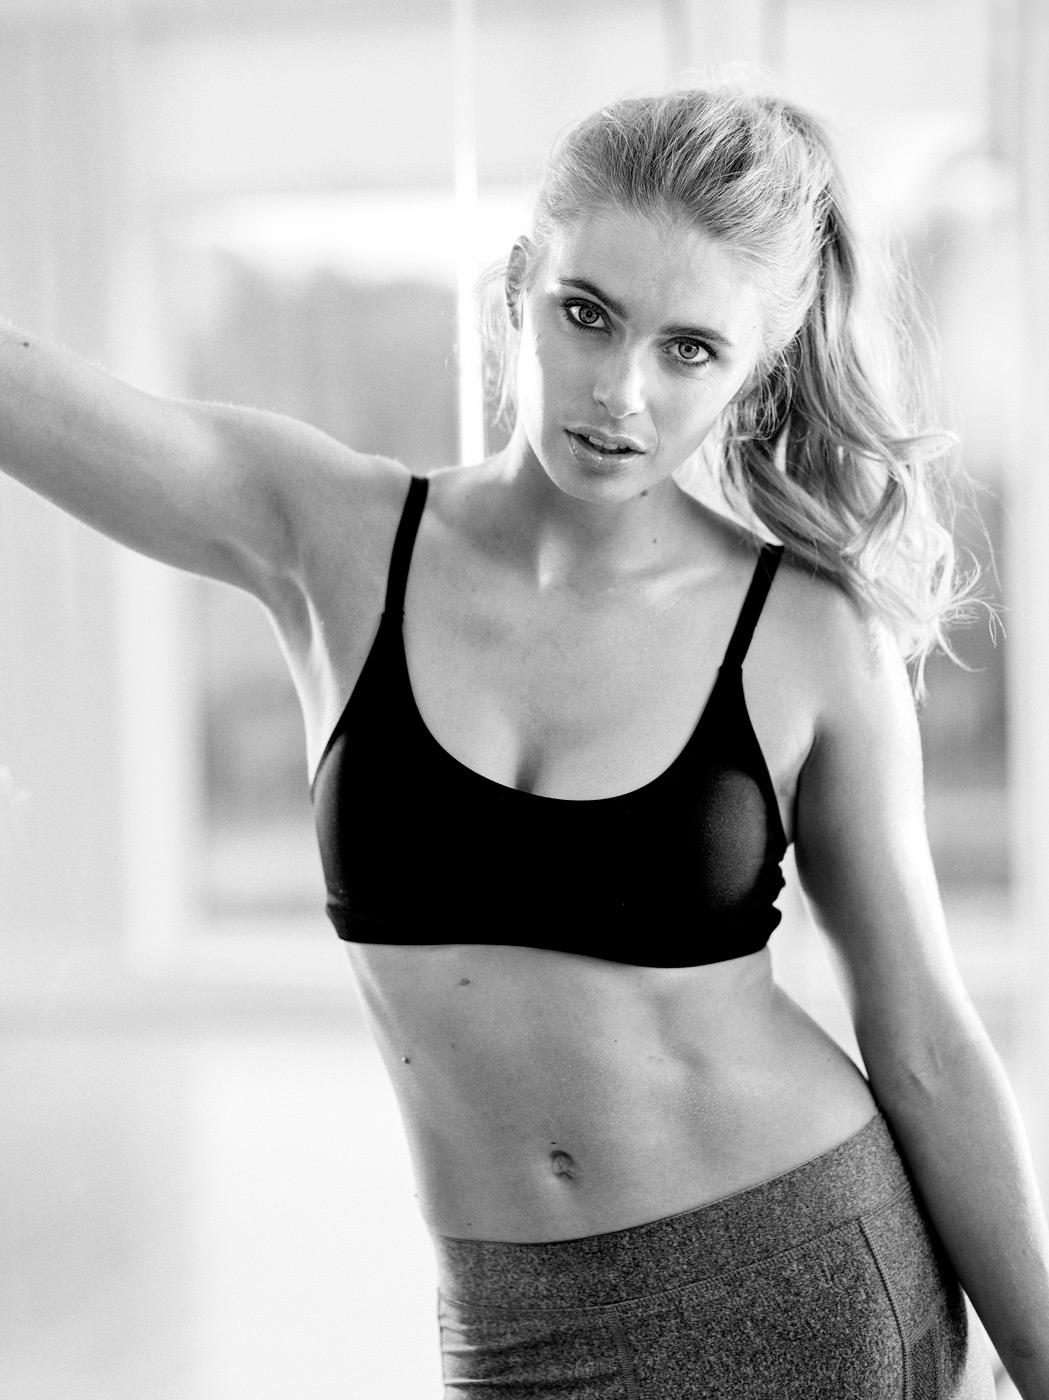 Women's fitness photoshoot